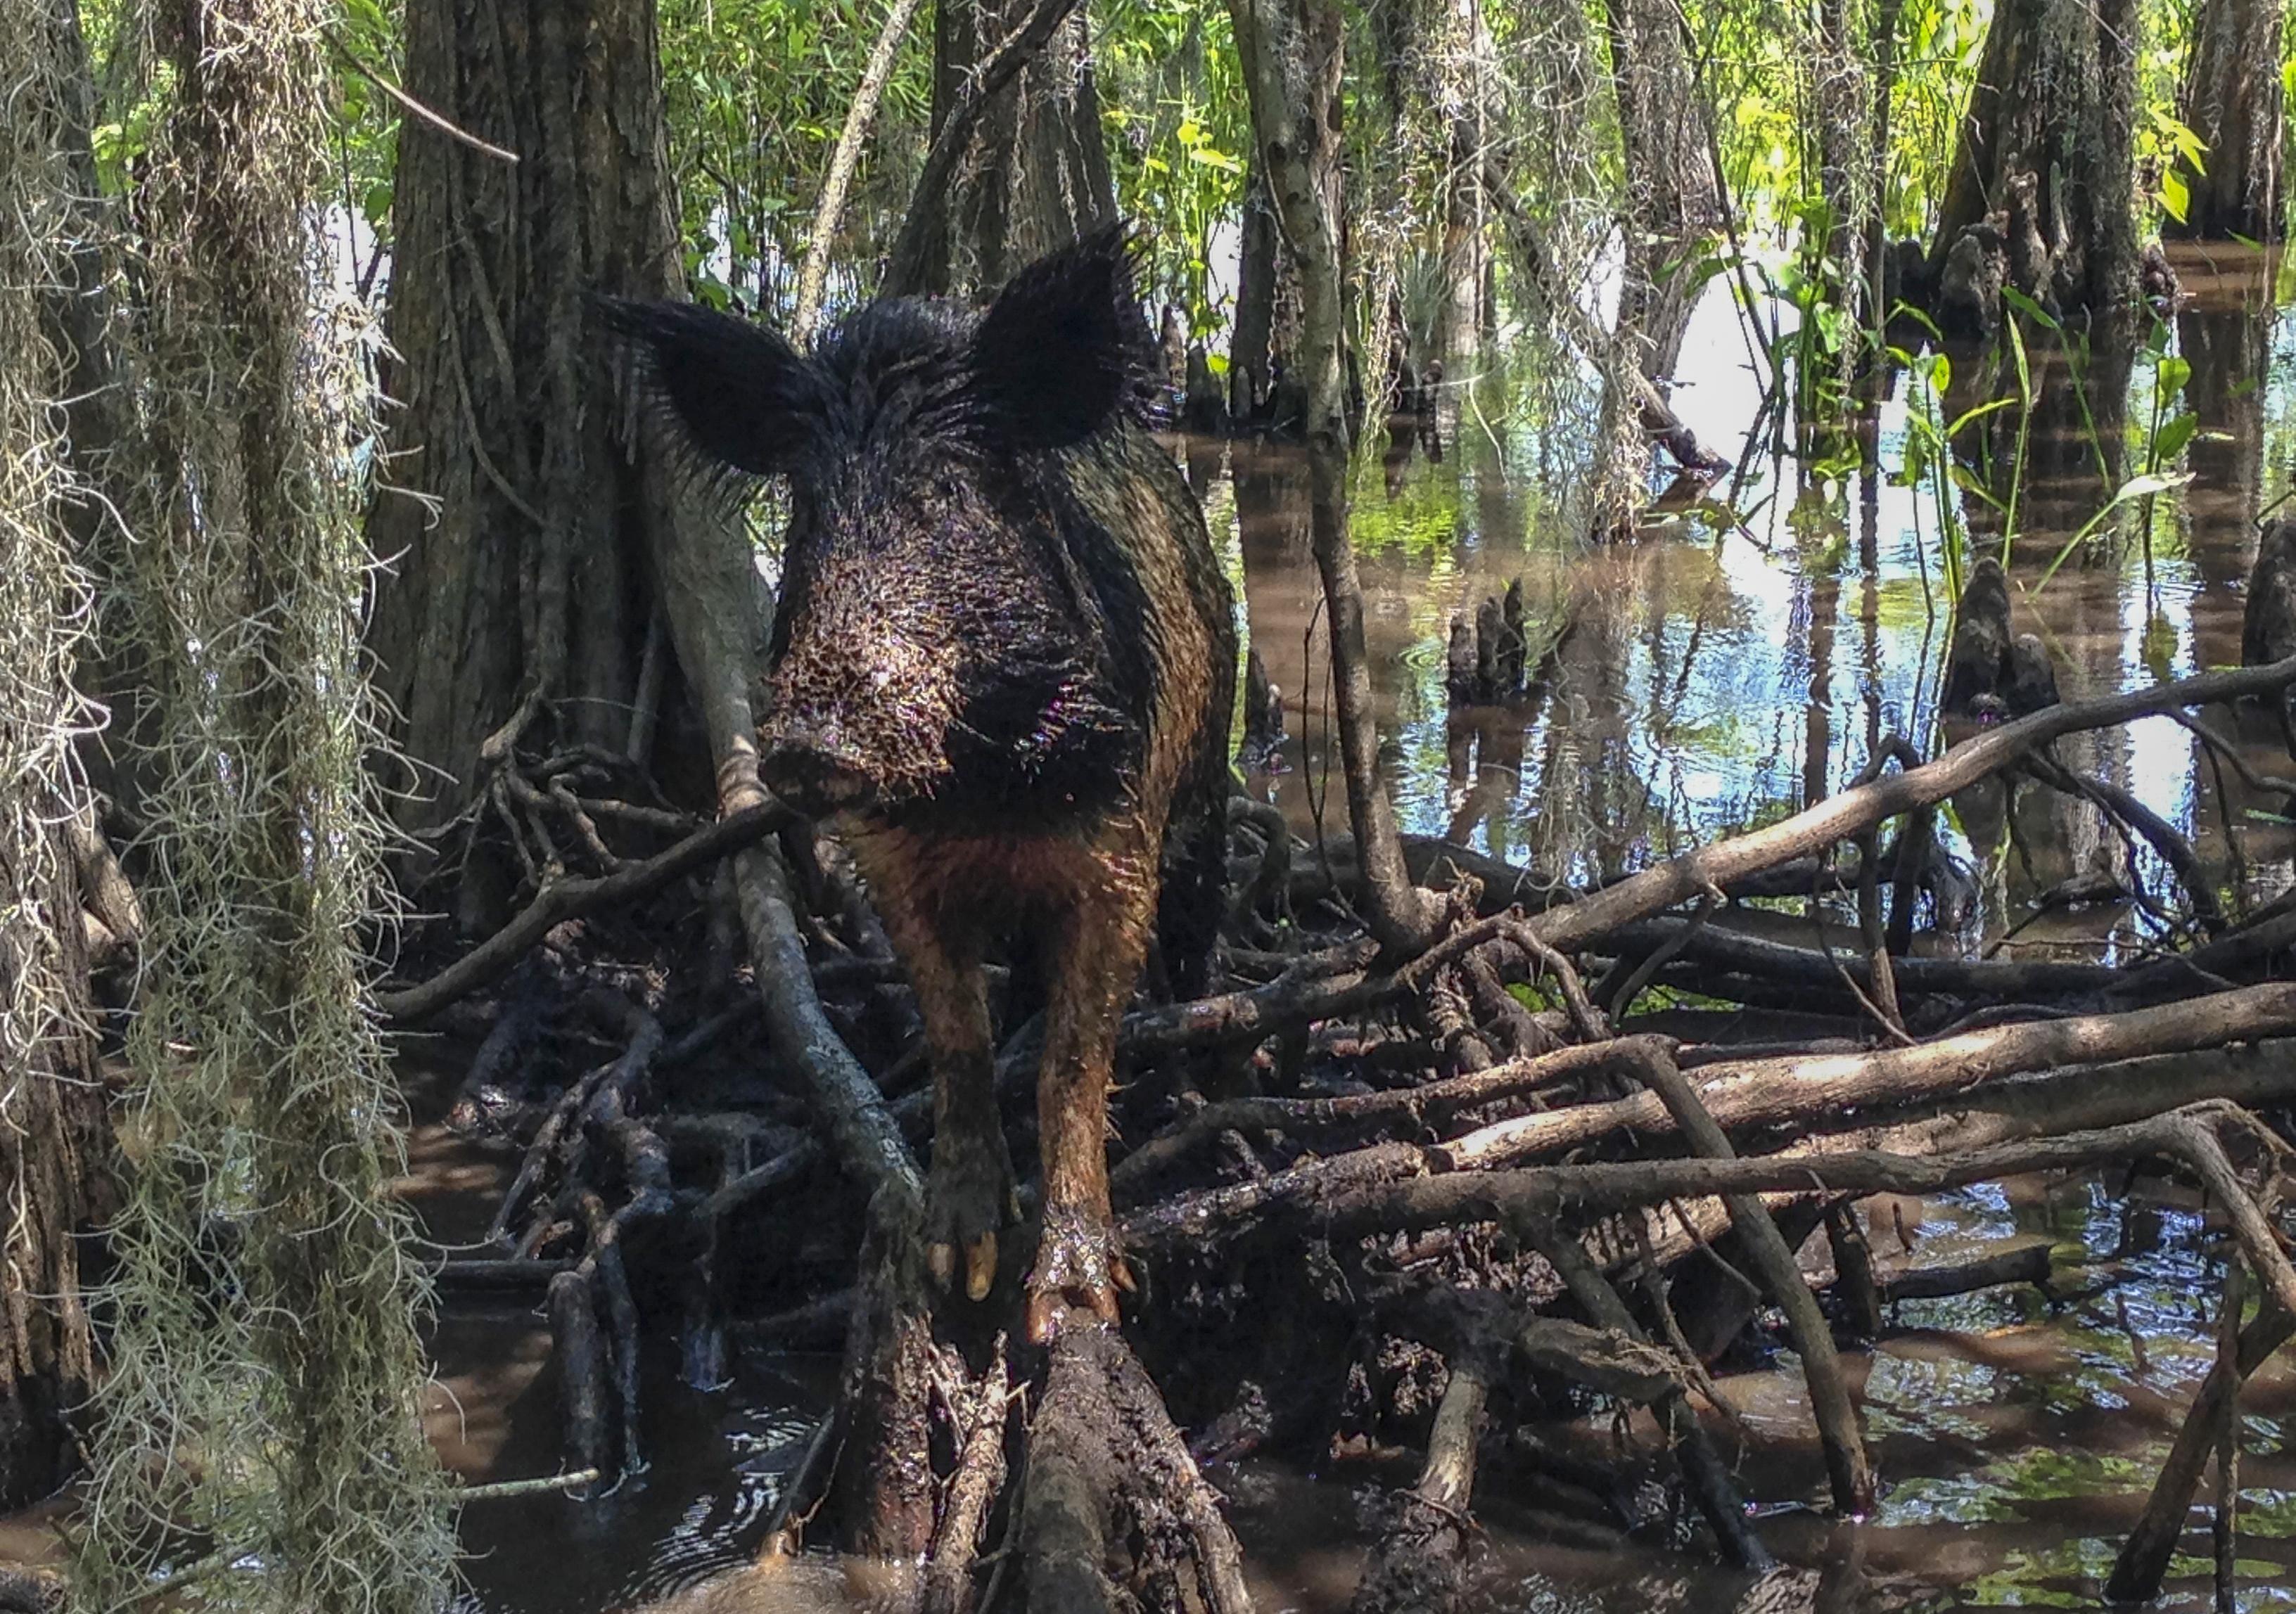 Florida residents complain pig family ruining neighborhood